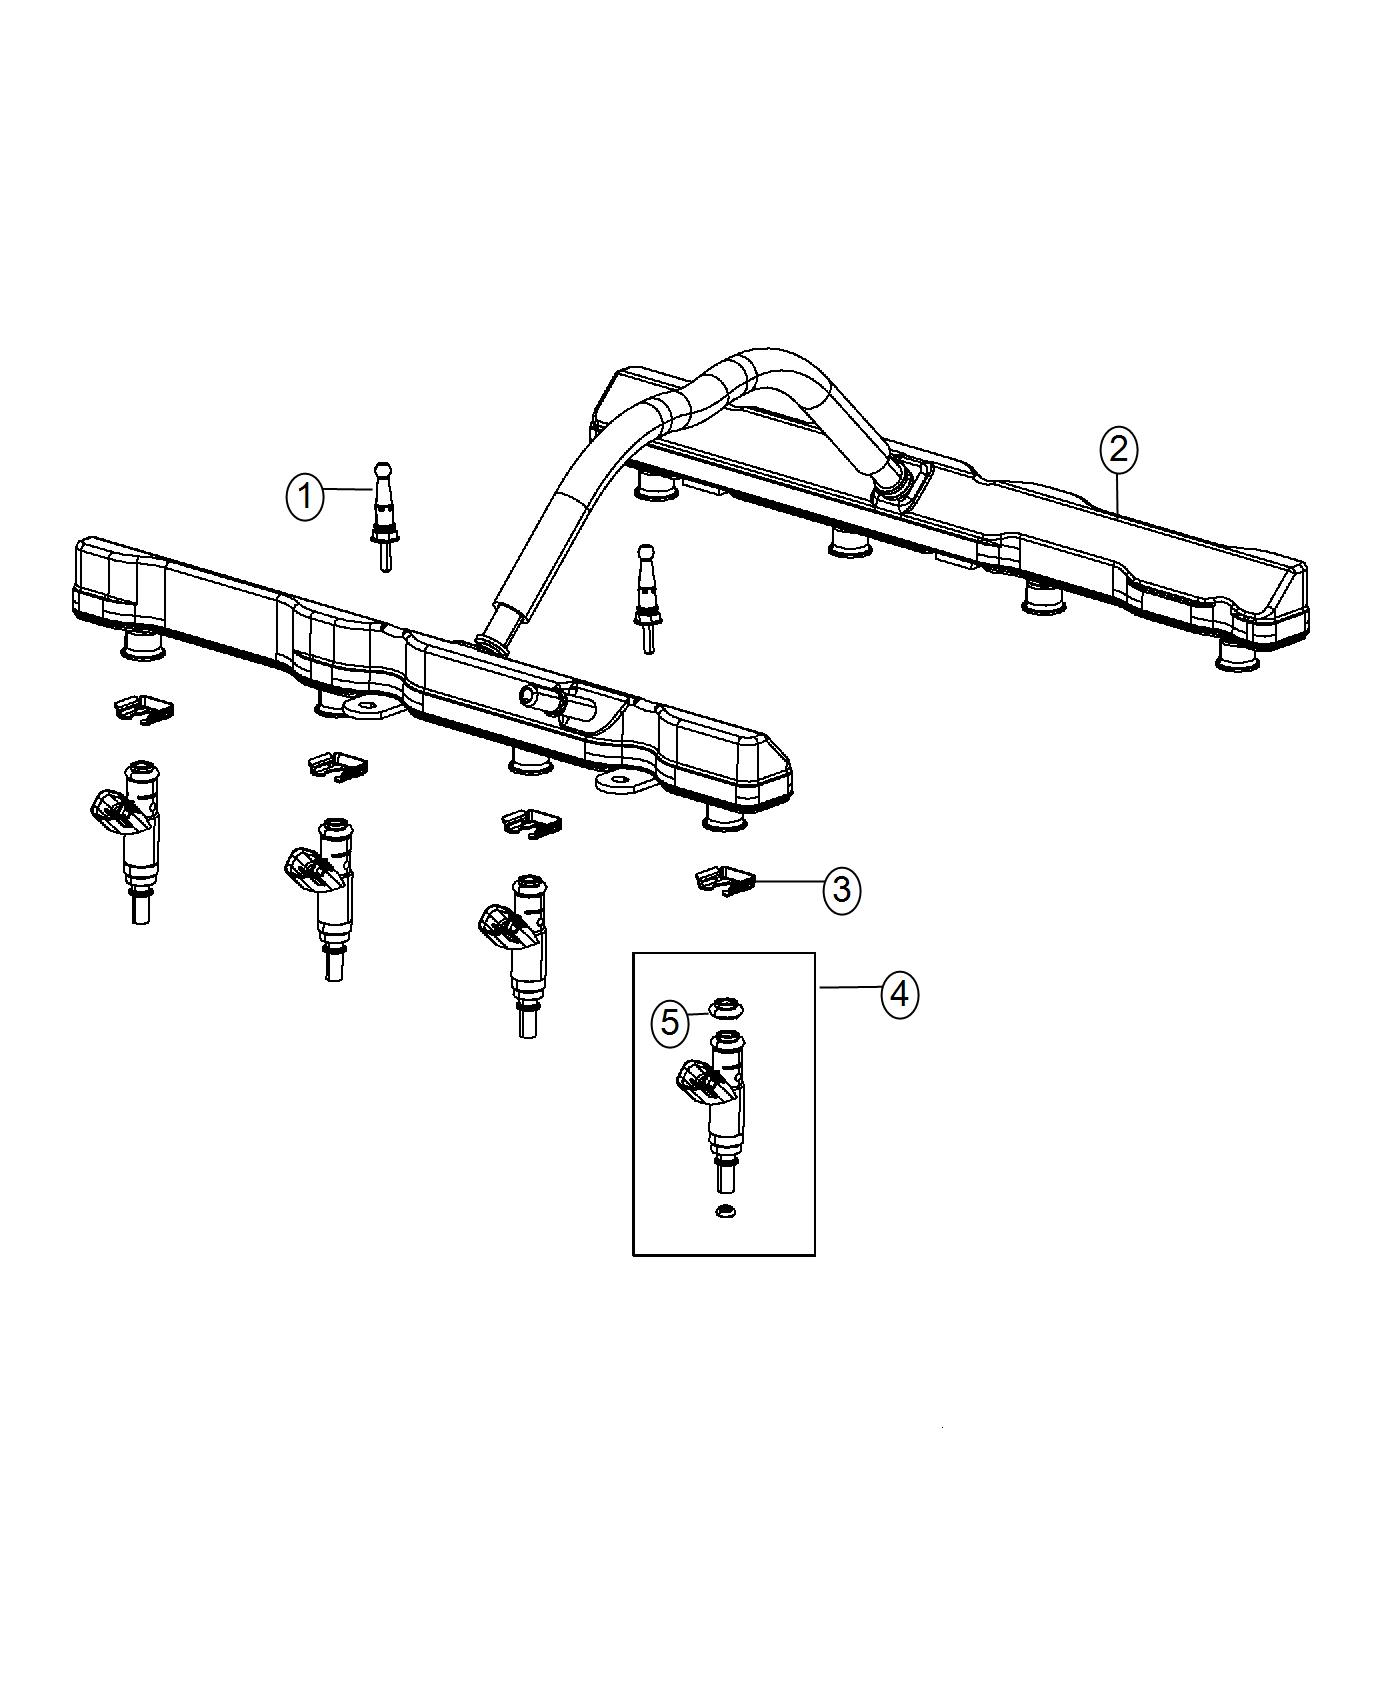 Dodge Charger Rail Fuel 6 4l Srt Hemi Smpi V8